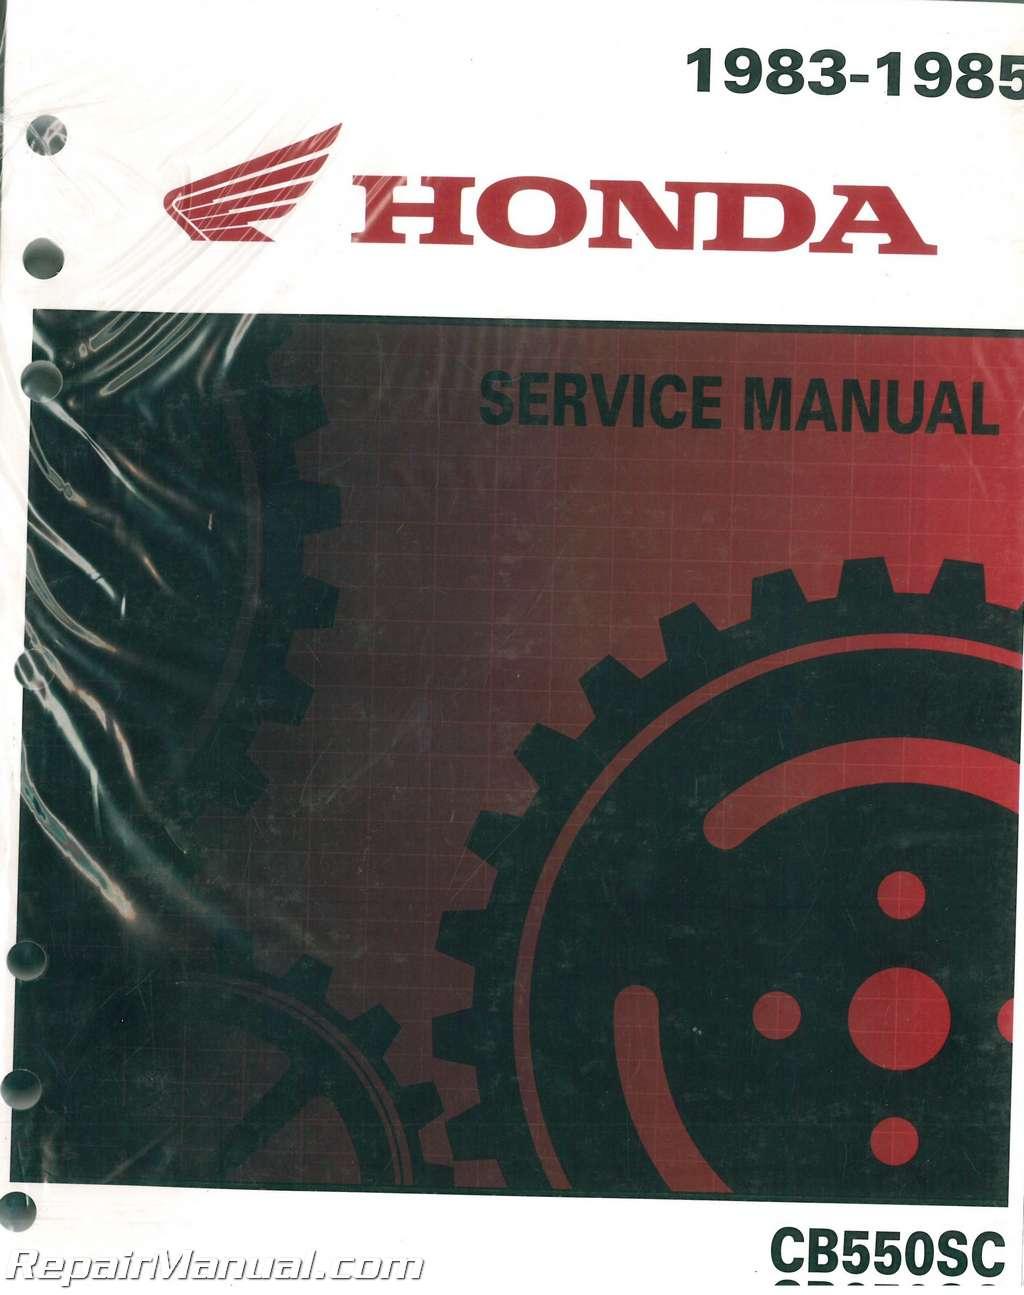 1983 1985 Honda Cb550 650sc Nighthawk Motorcycle Service